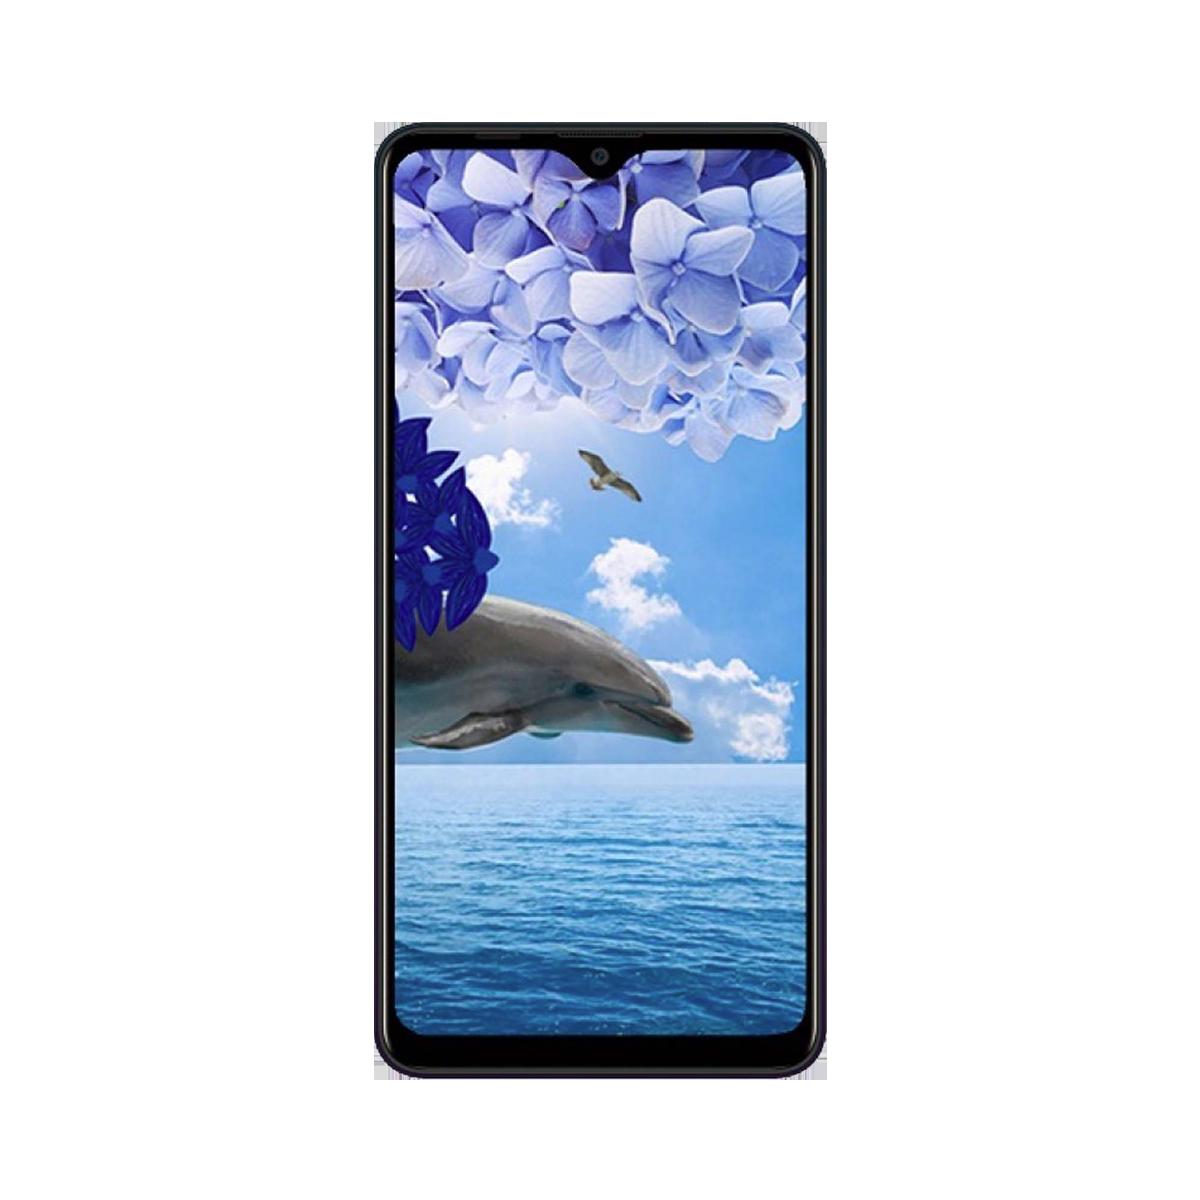 Reeder P13 Blue Max 64 GB Mavi